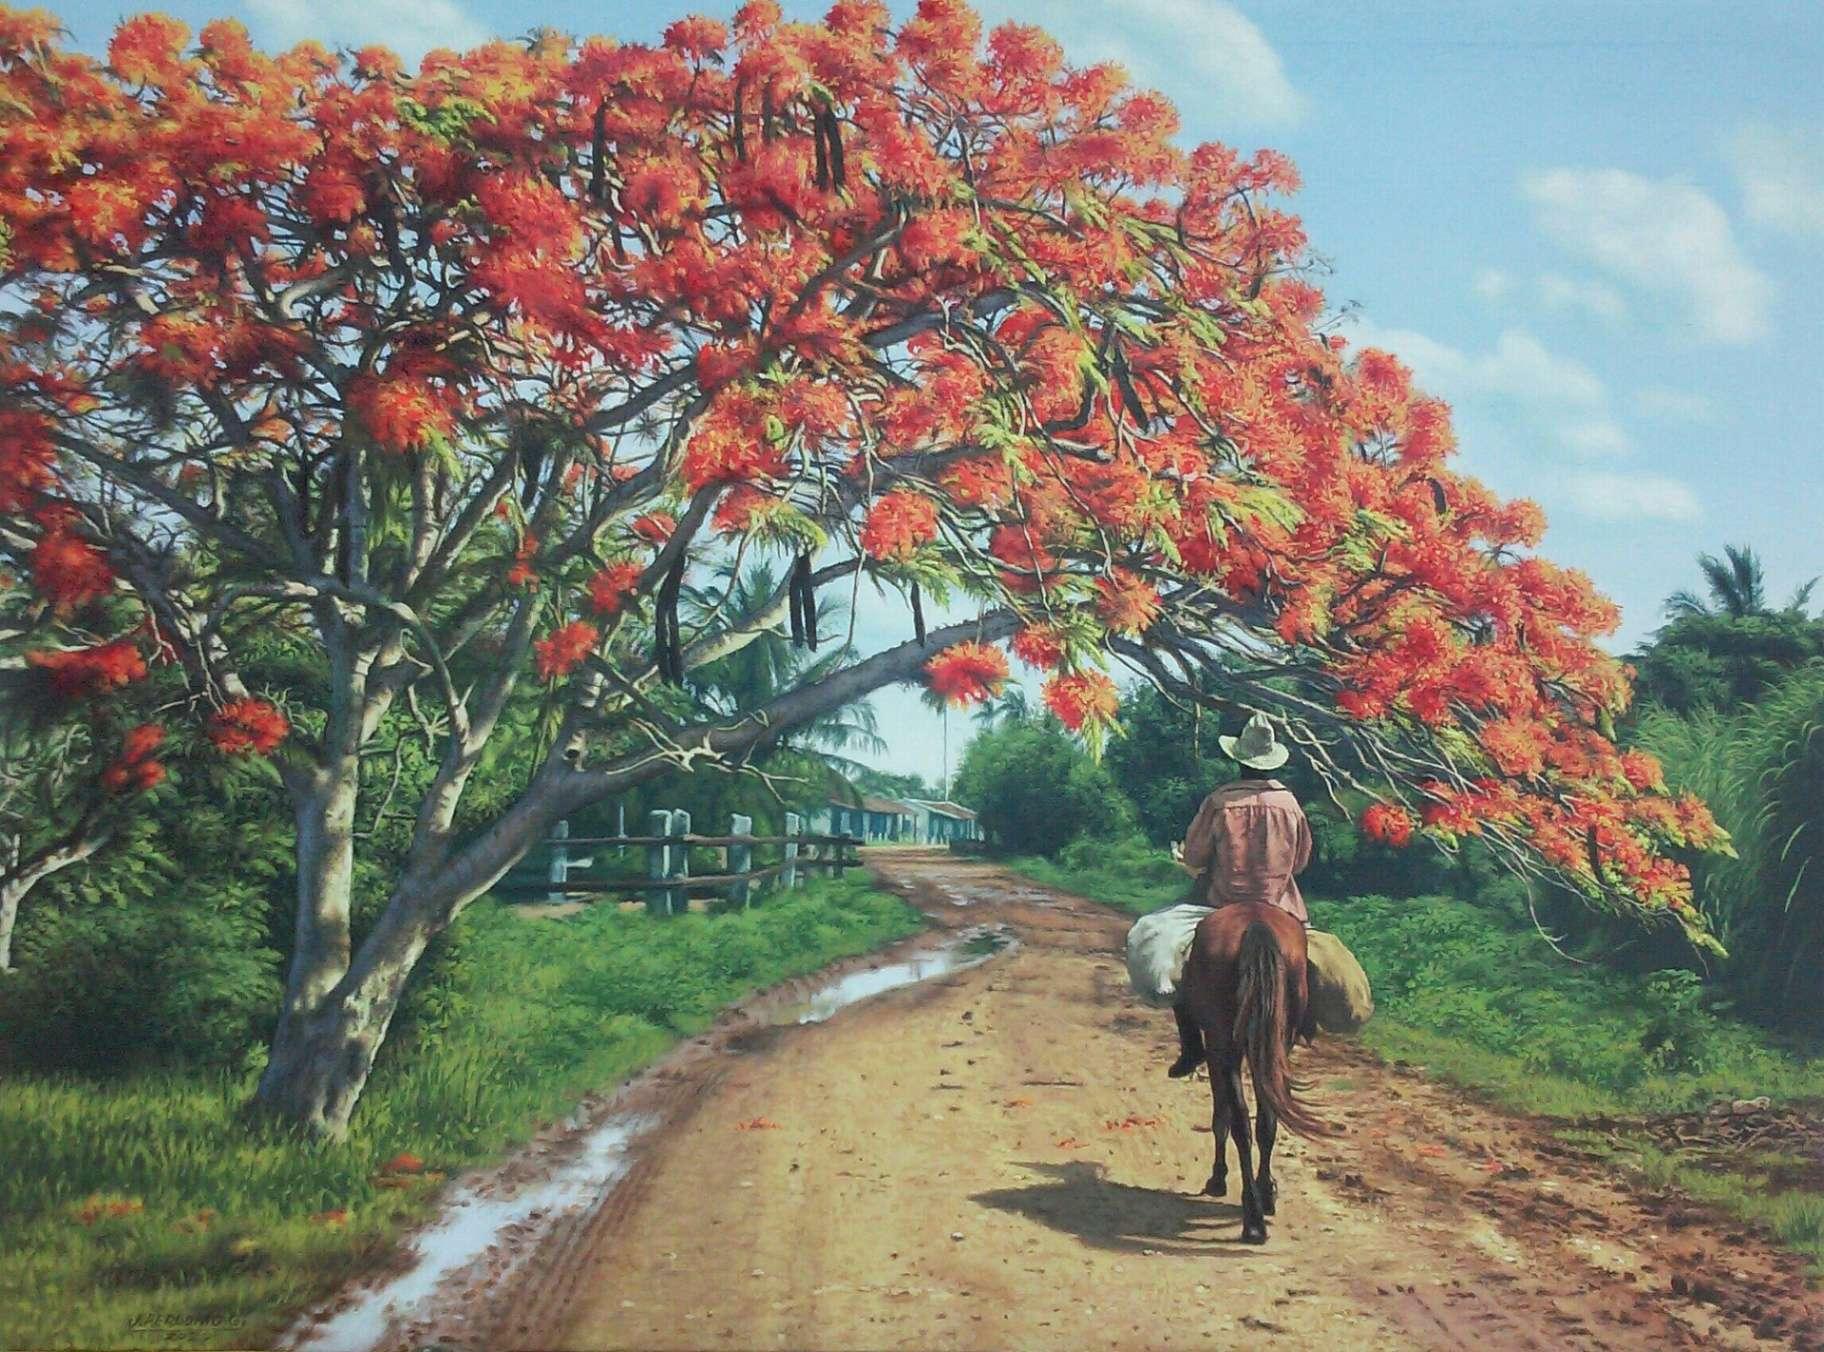 Obra: Flamboyan junto al camino